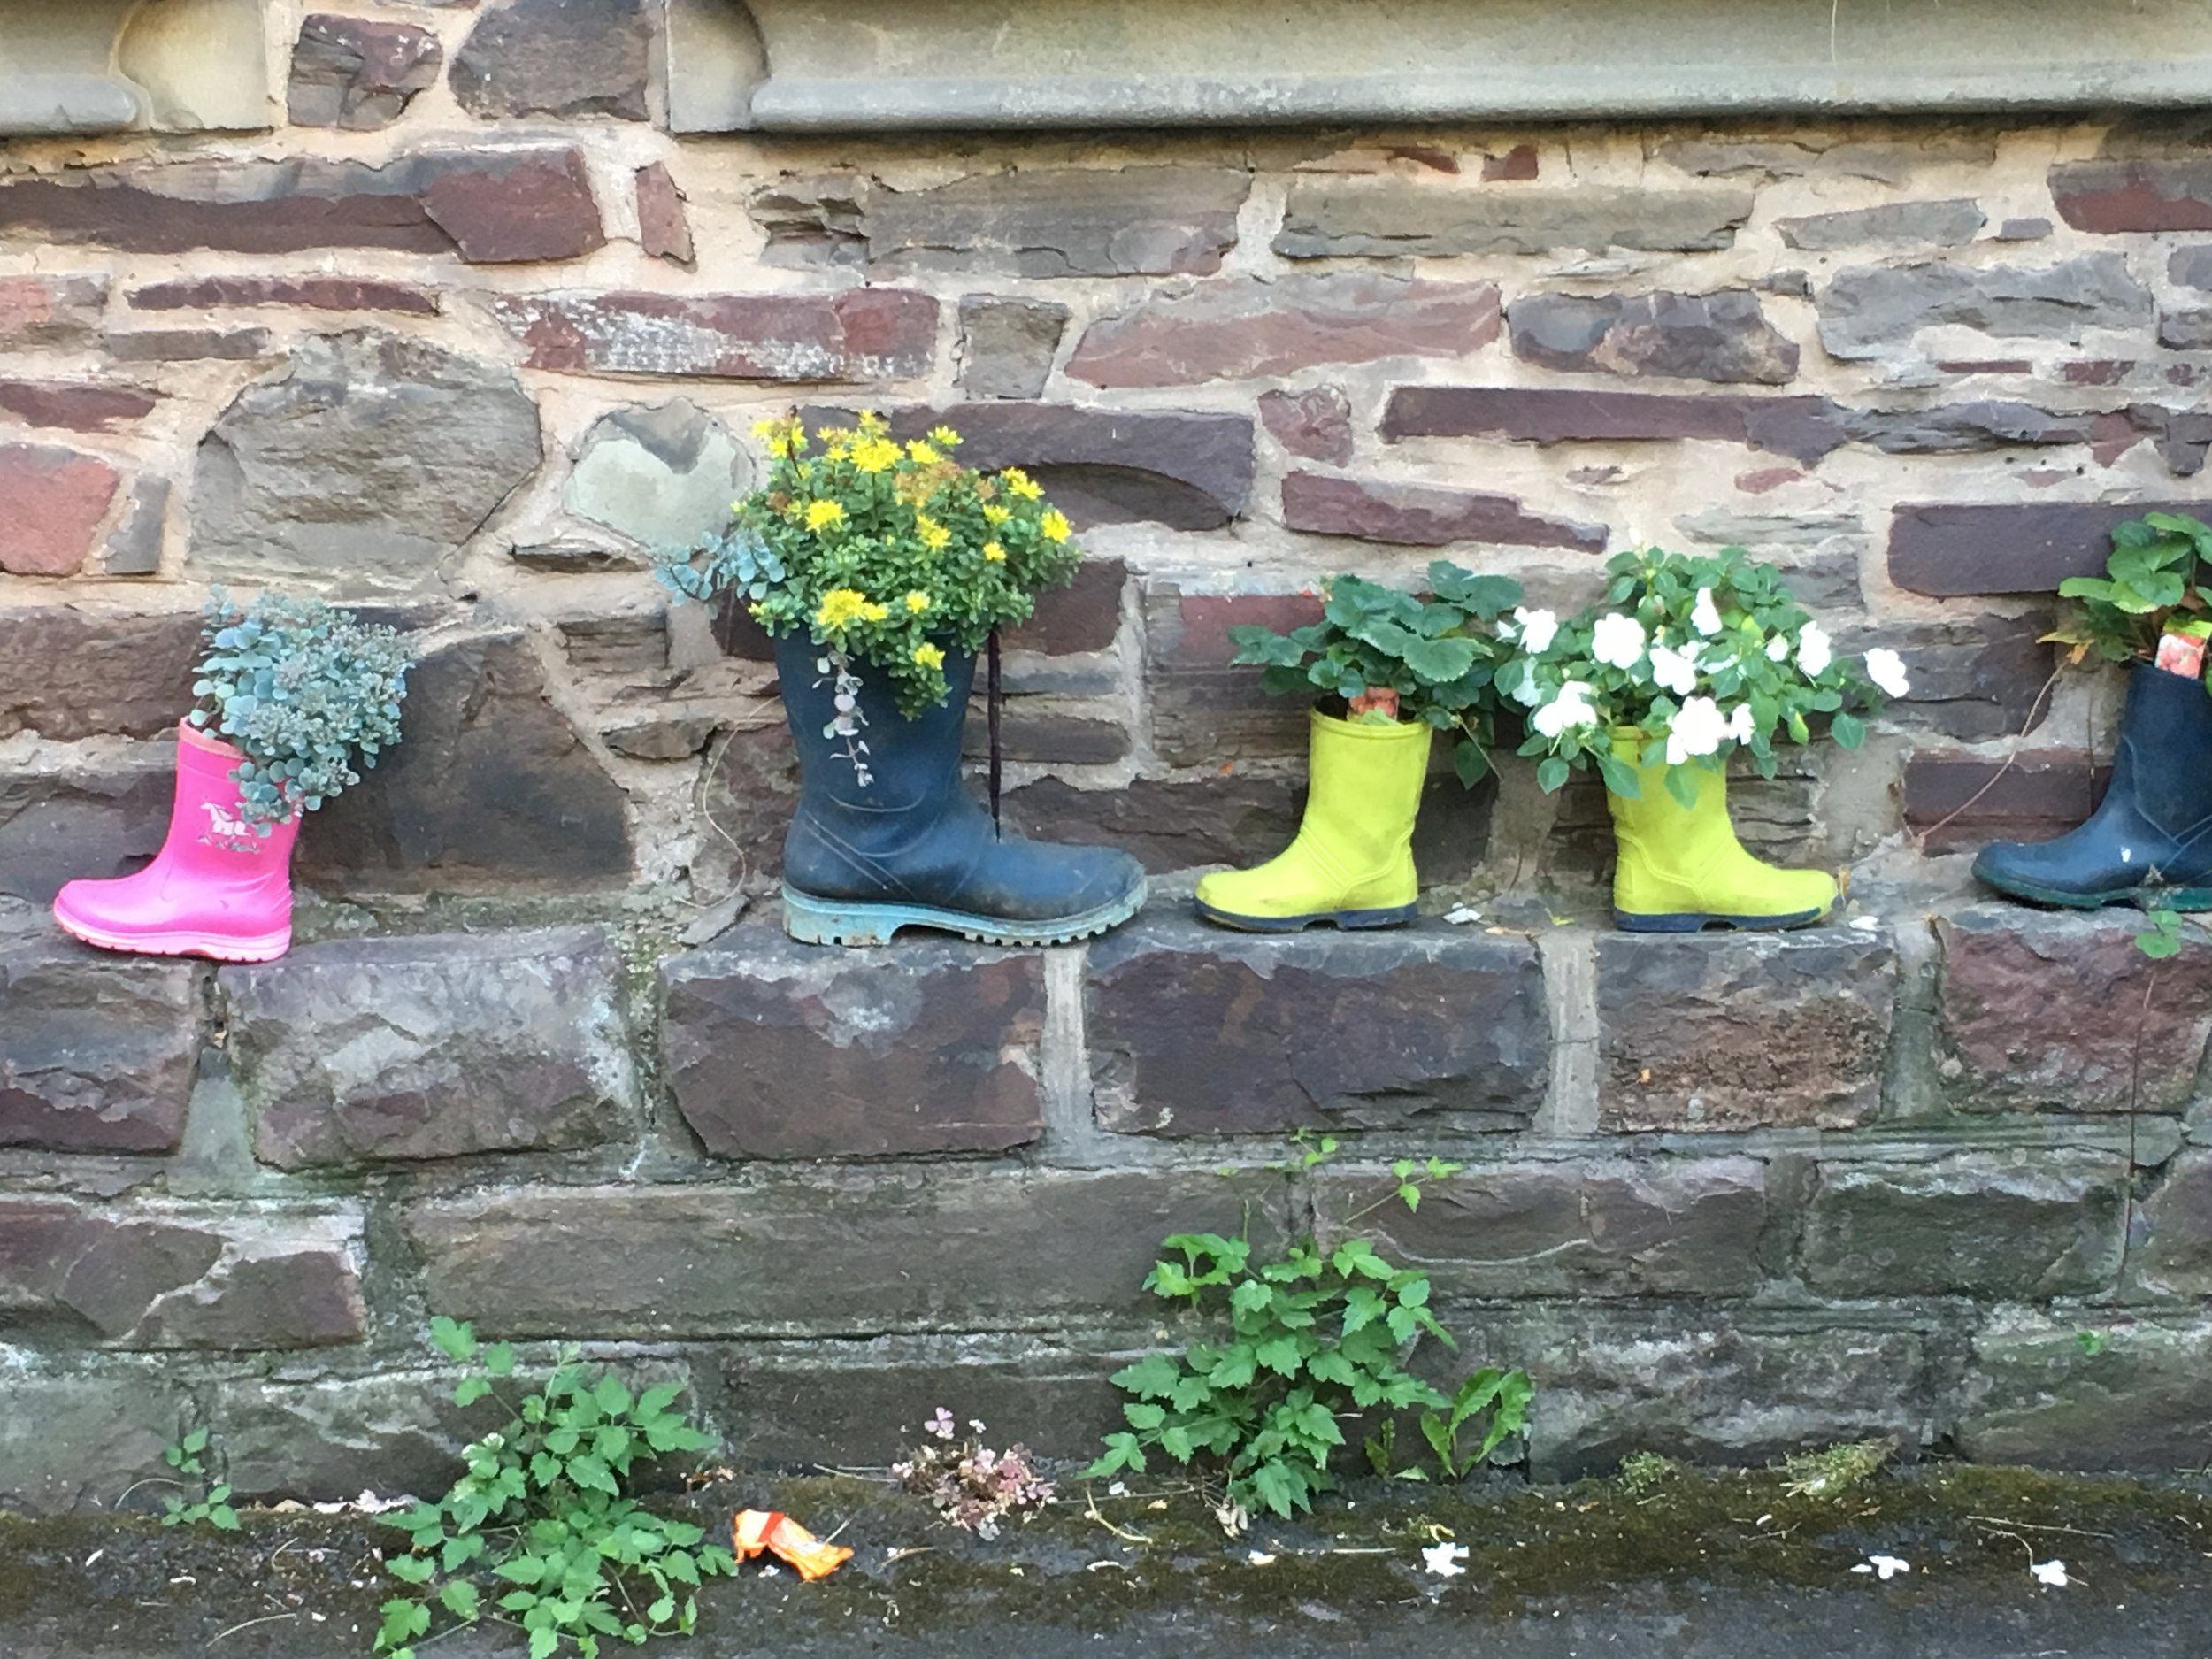 Children's wellies form sweet little planters in the sleepy village of Moselkern, Germany.